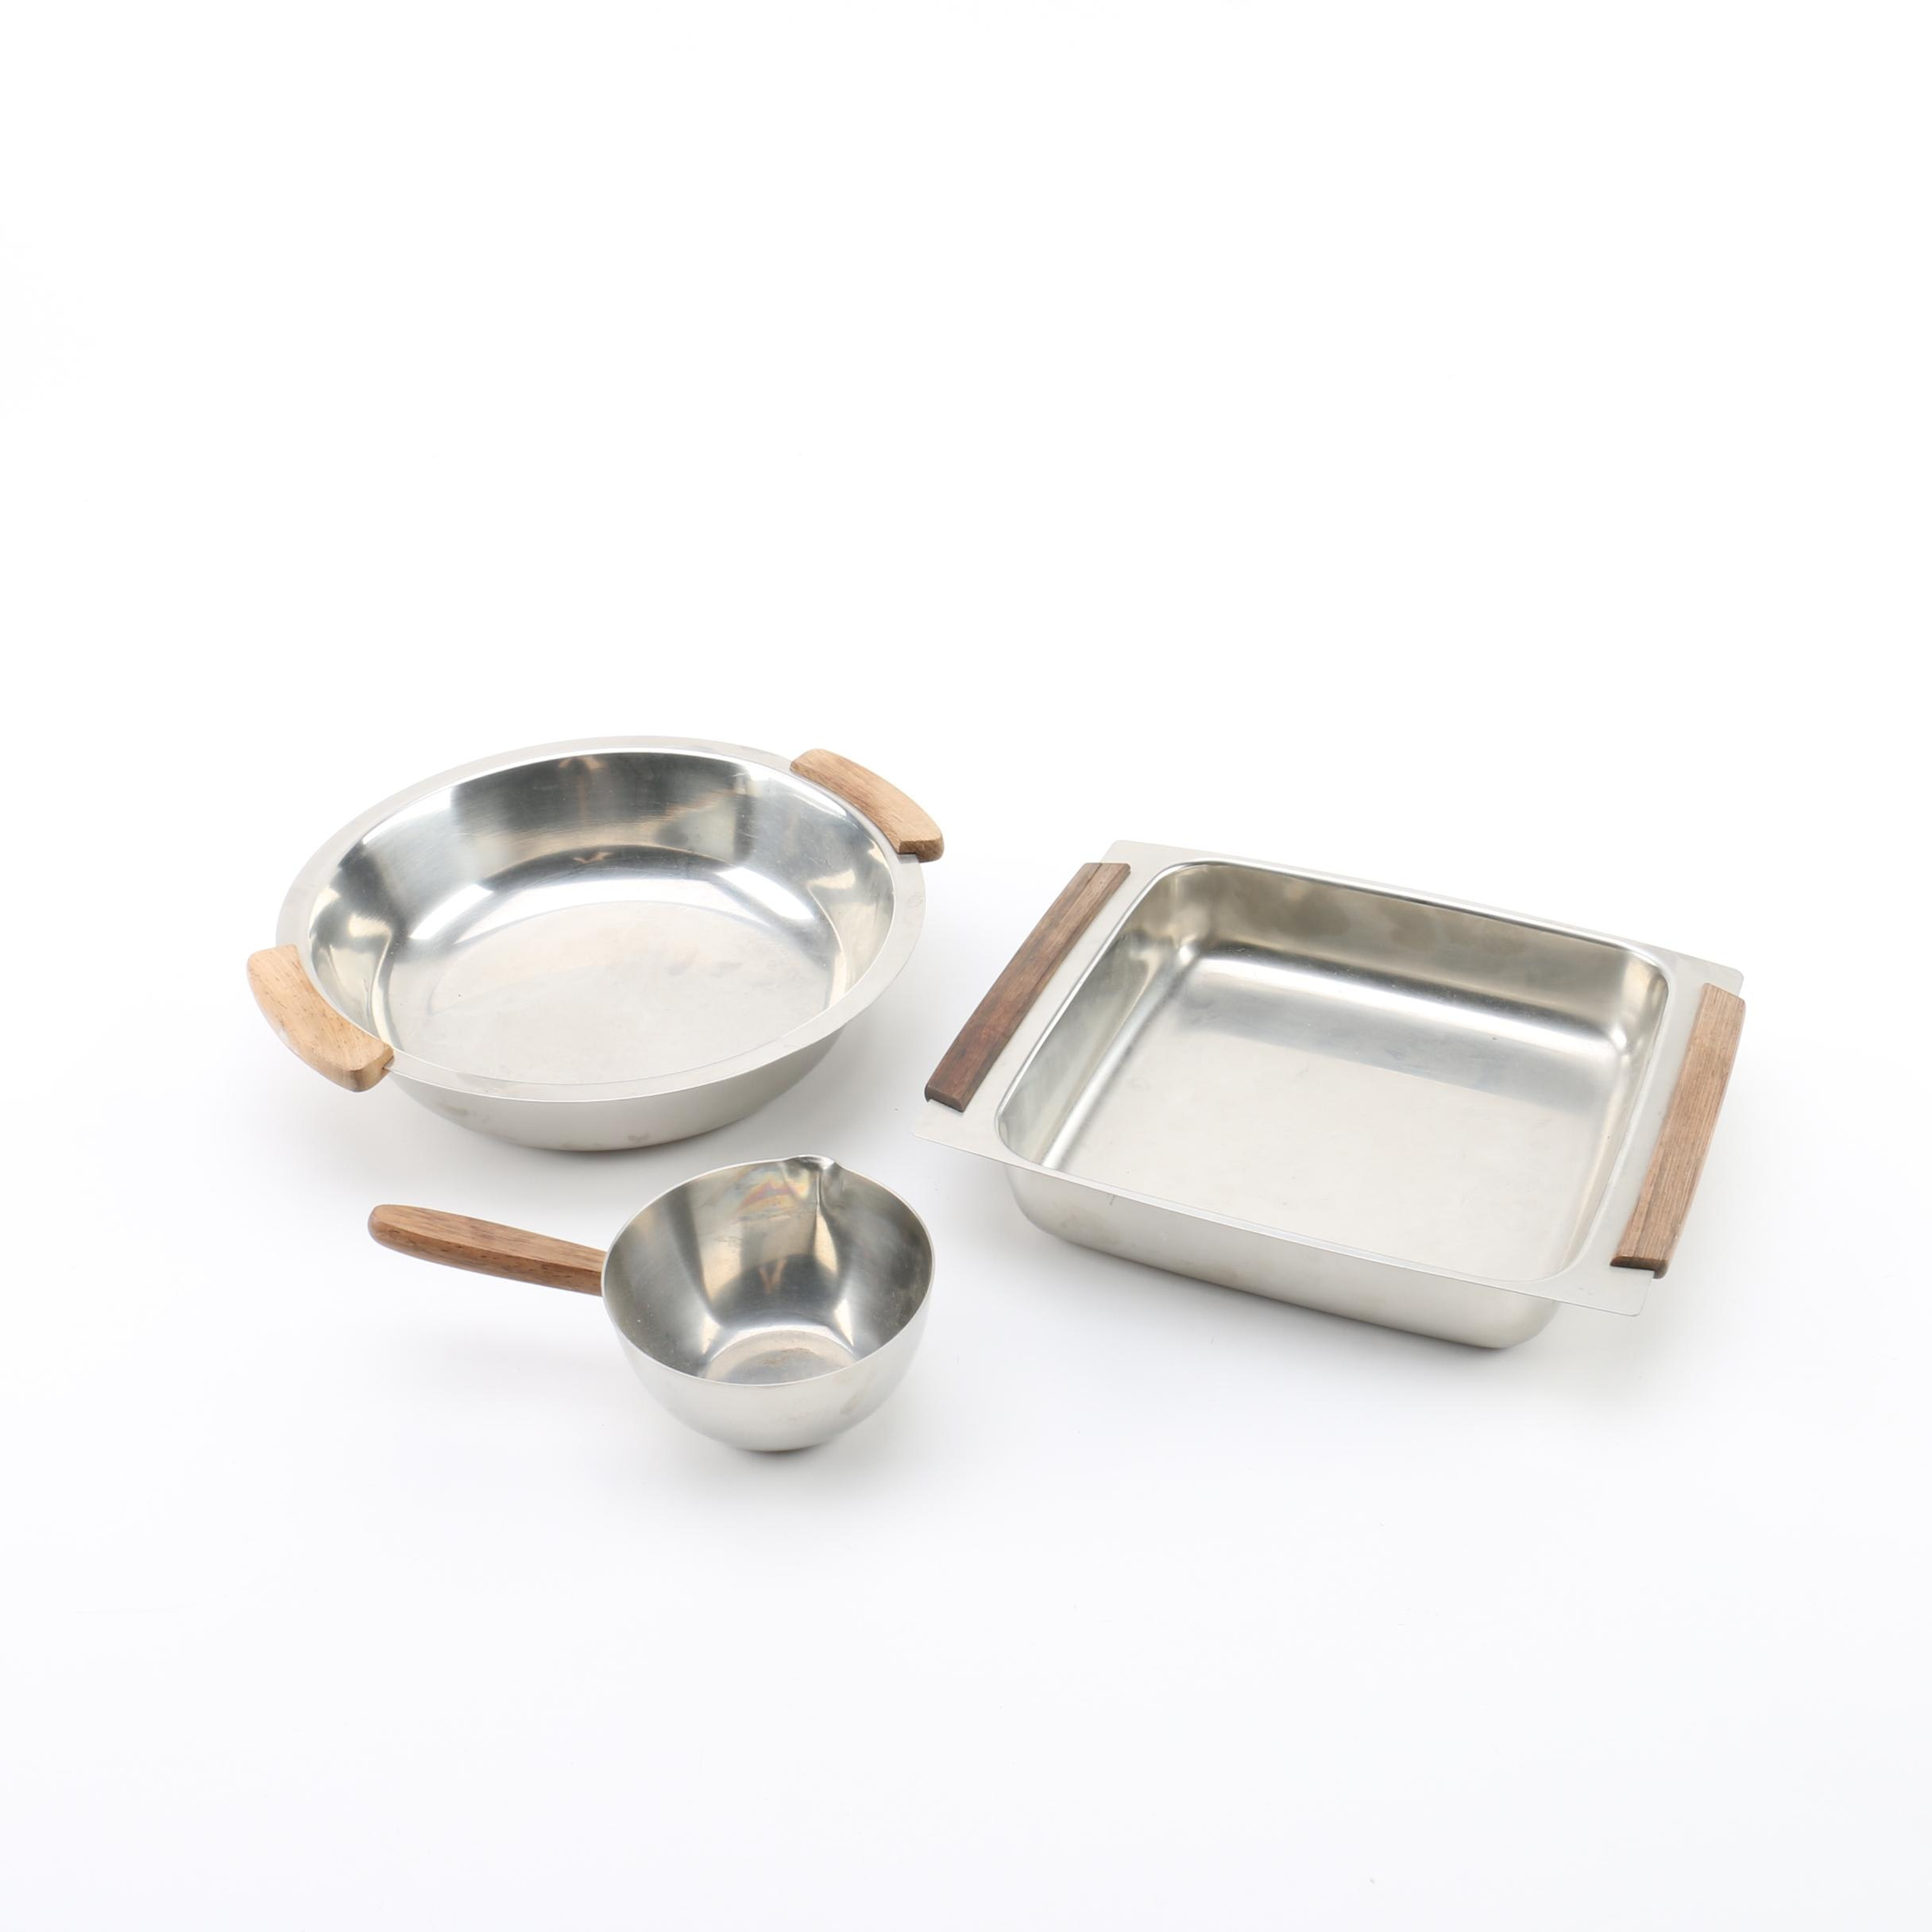 Danish Modern Bakeware Including NMT Stainless Steel